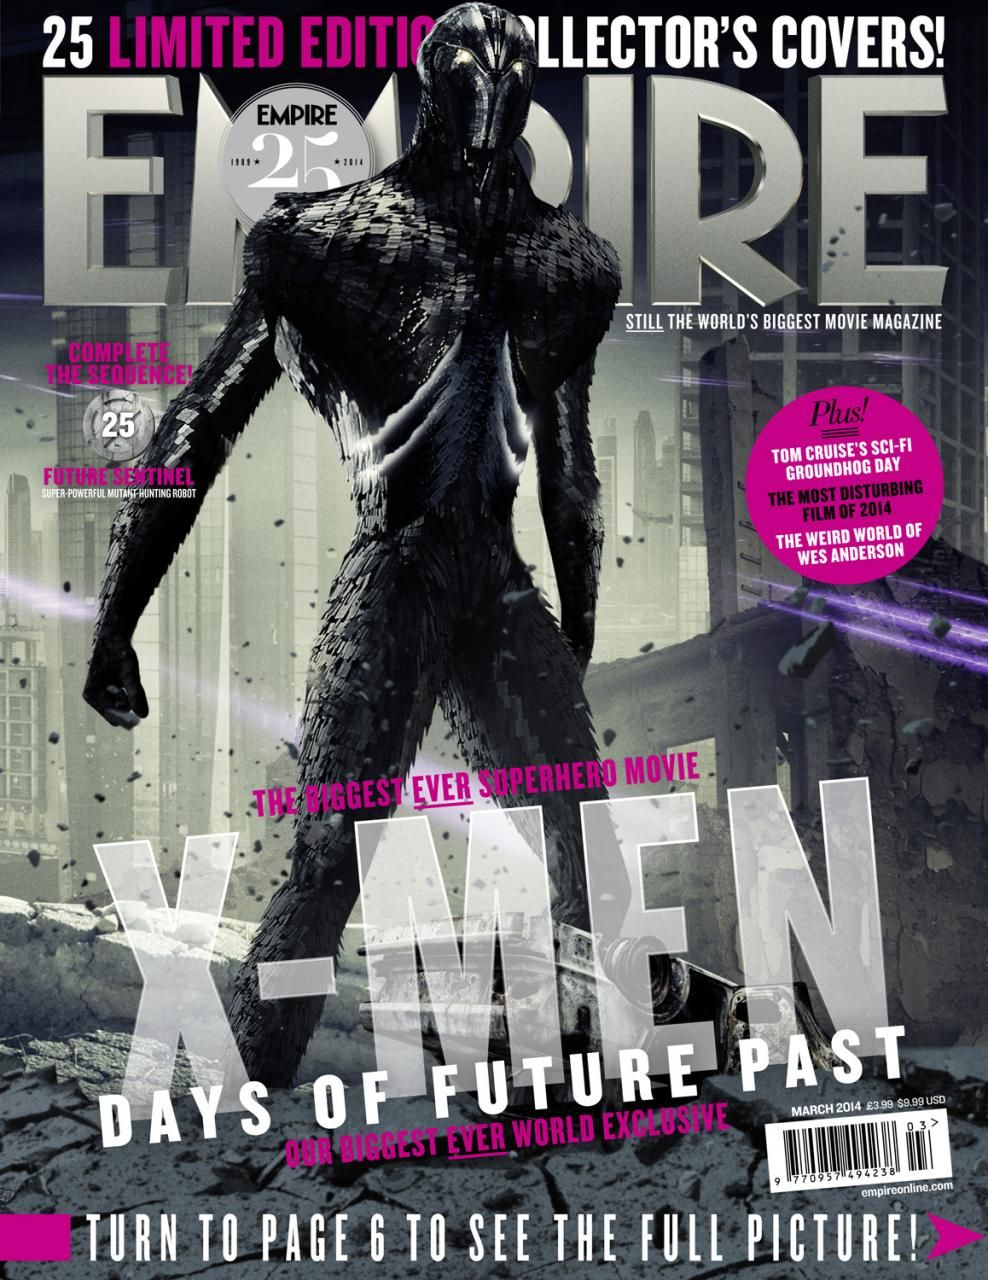 X Men Days Of Future Past Future Sentinel And More Magazine Covers Days Of Future Past X Men Movie Magazine